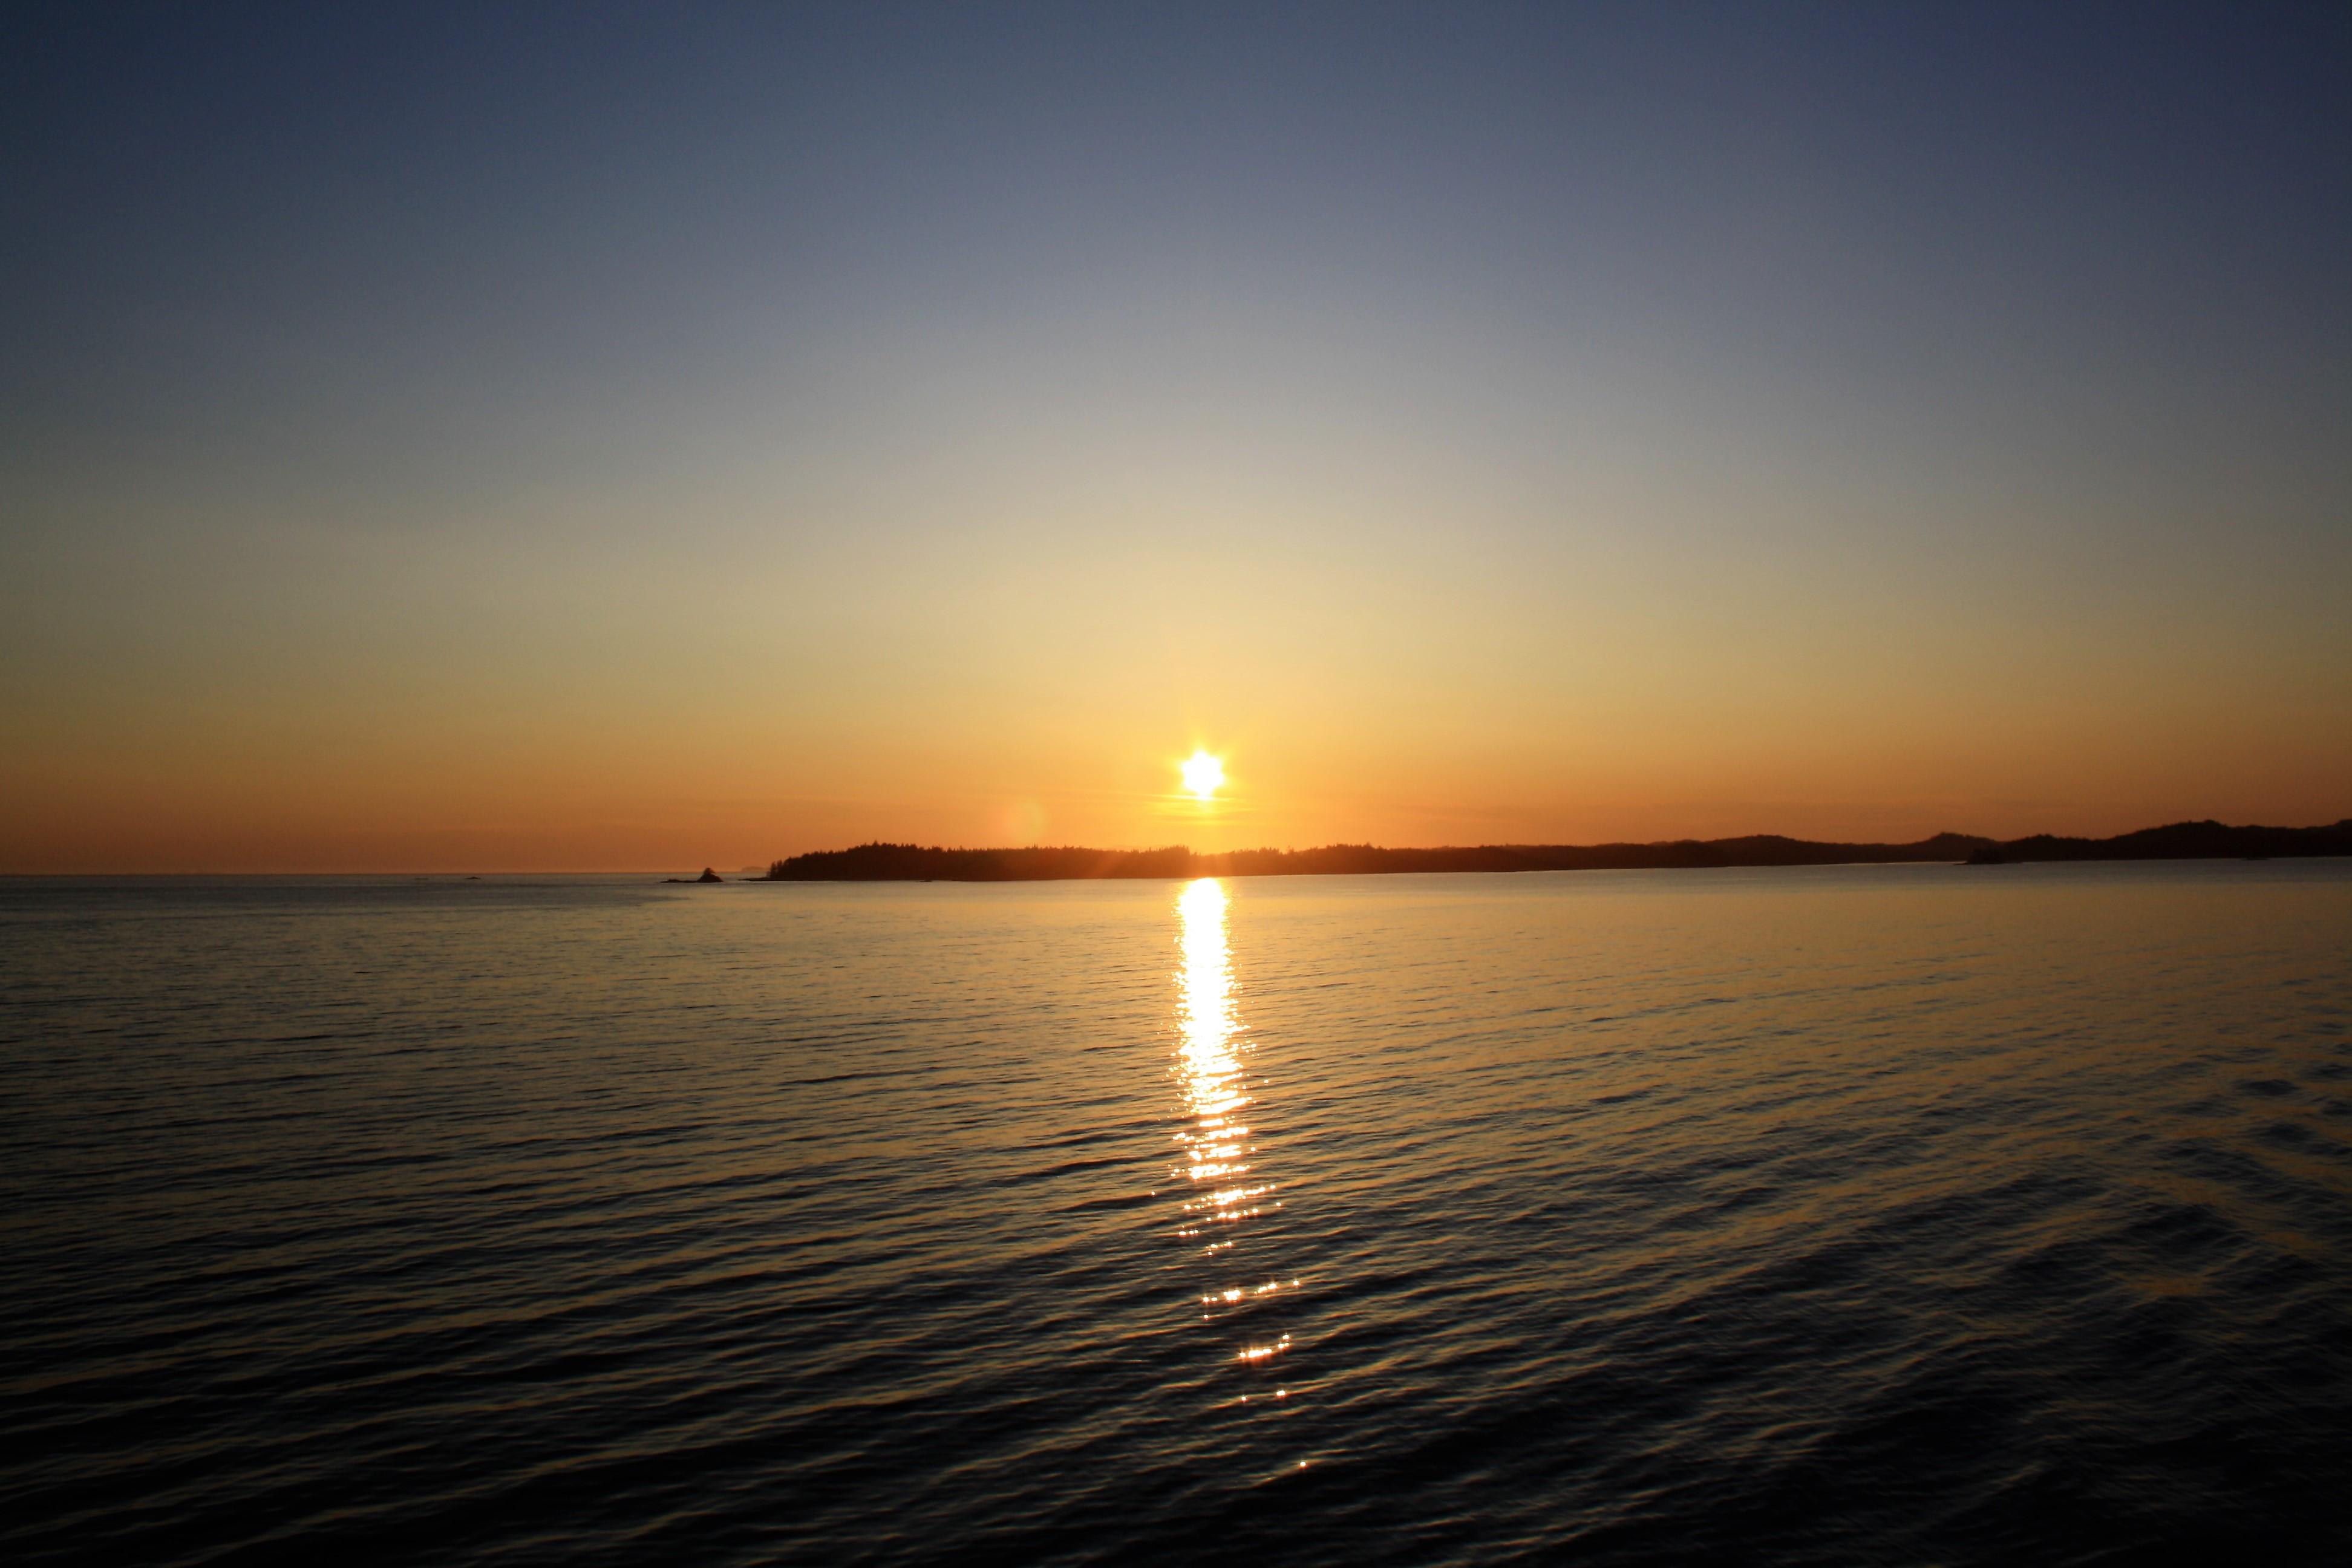 DM_nature_sunsetssunrises_haidagwaii_221